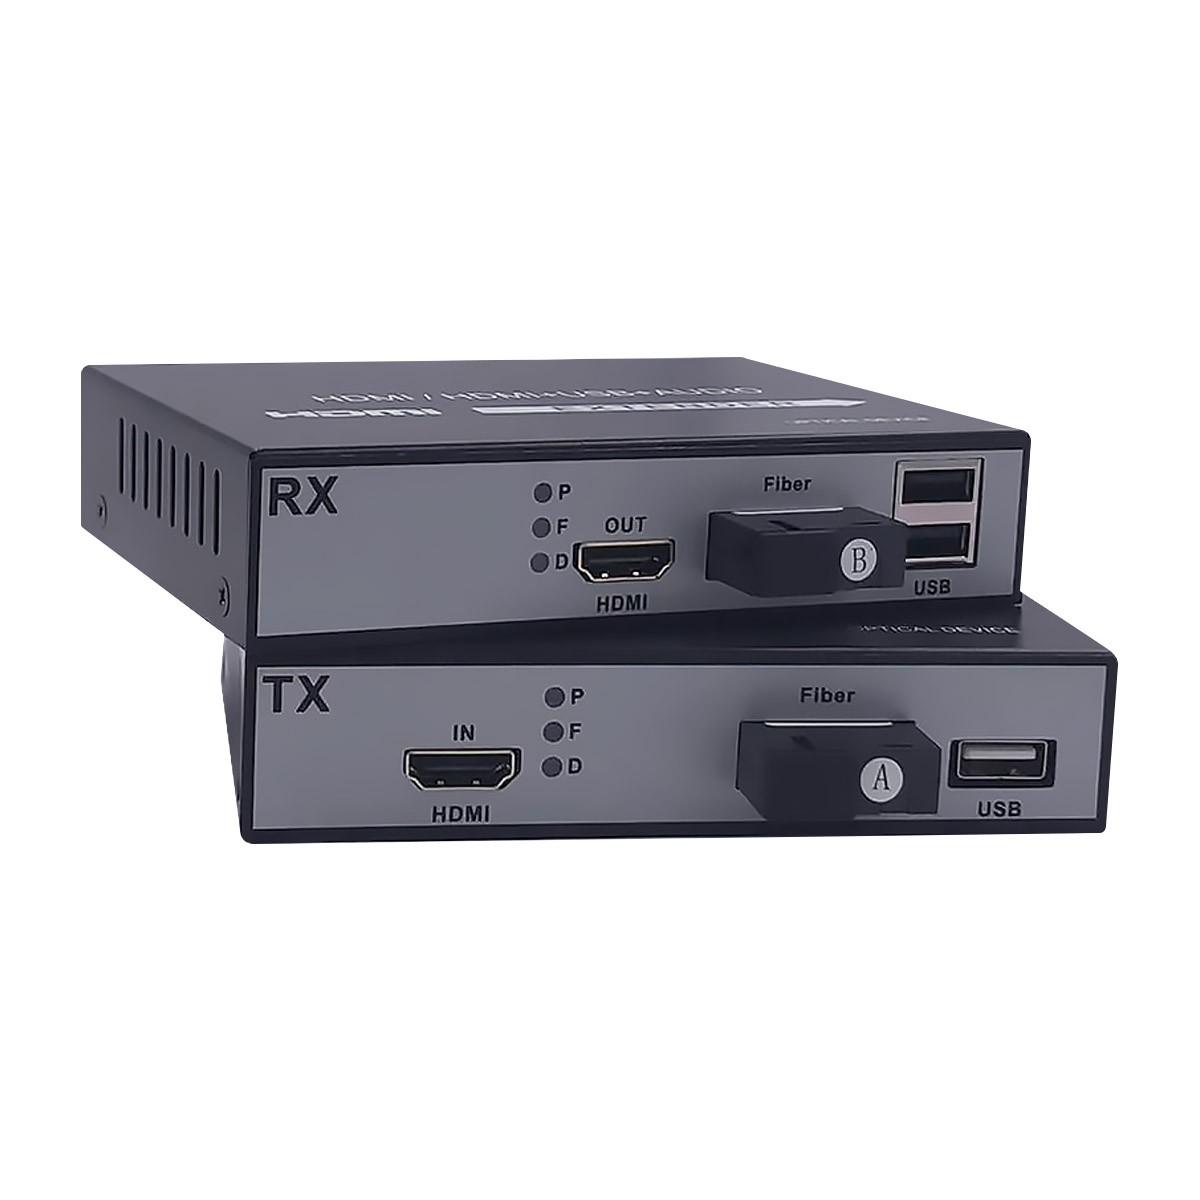 HDMI 1080p / USB Transmitter Receiver Extension via Optical Fiber (Pair)